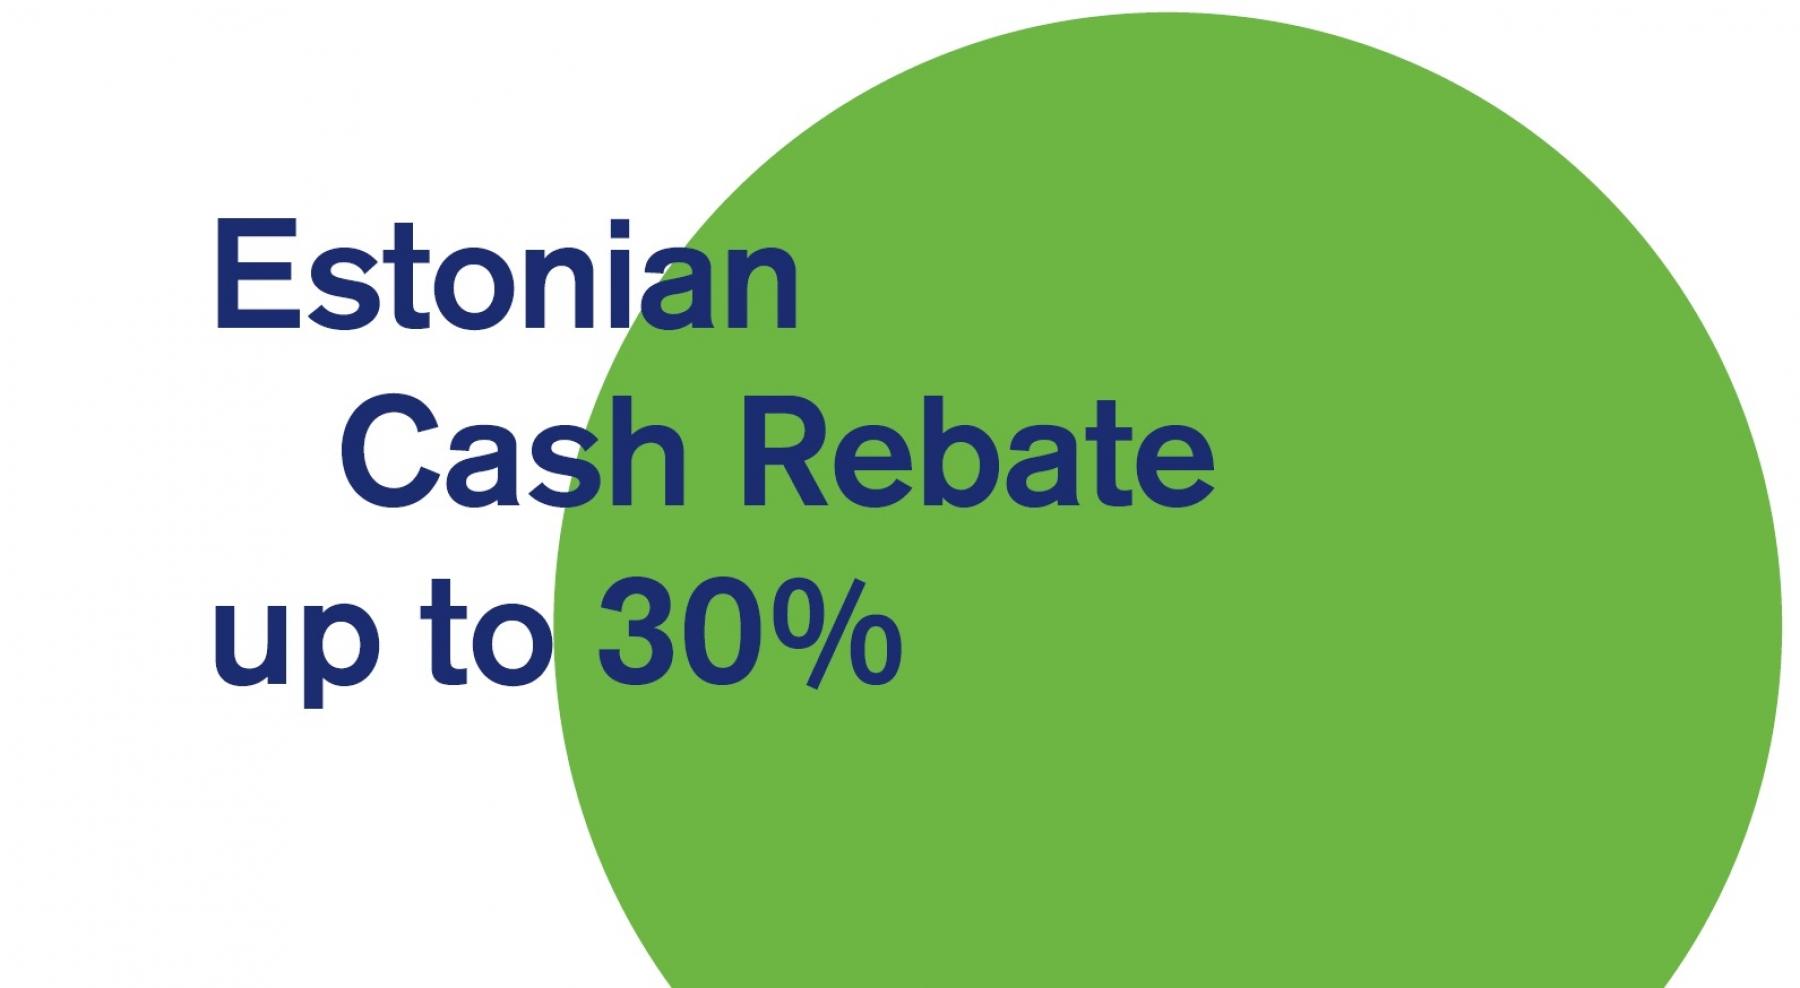 Estonia's Cash Rebate Pilot Project Exceeds Expectations